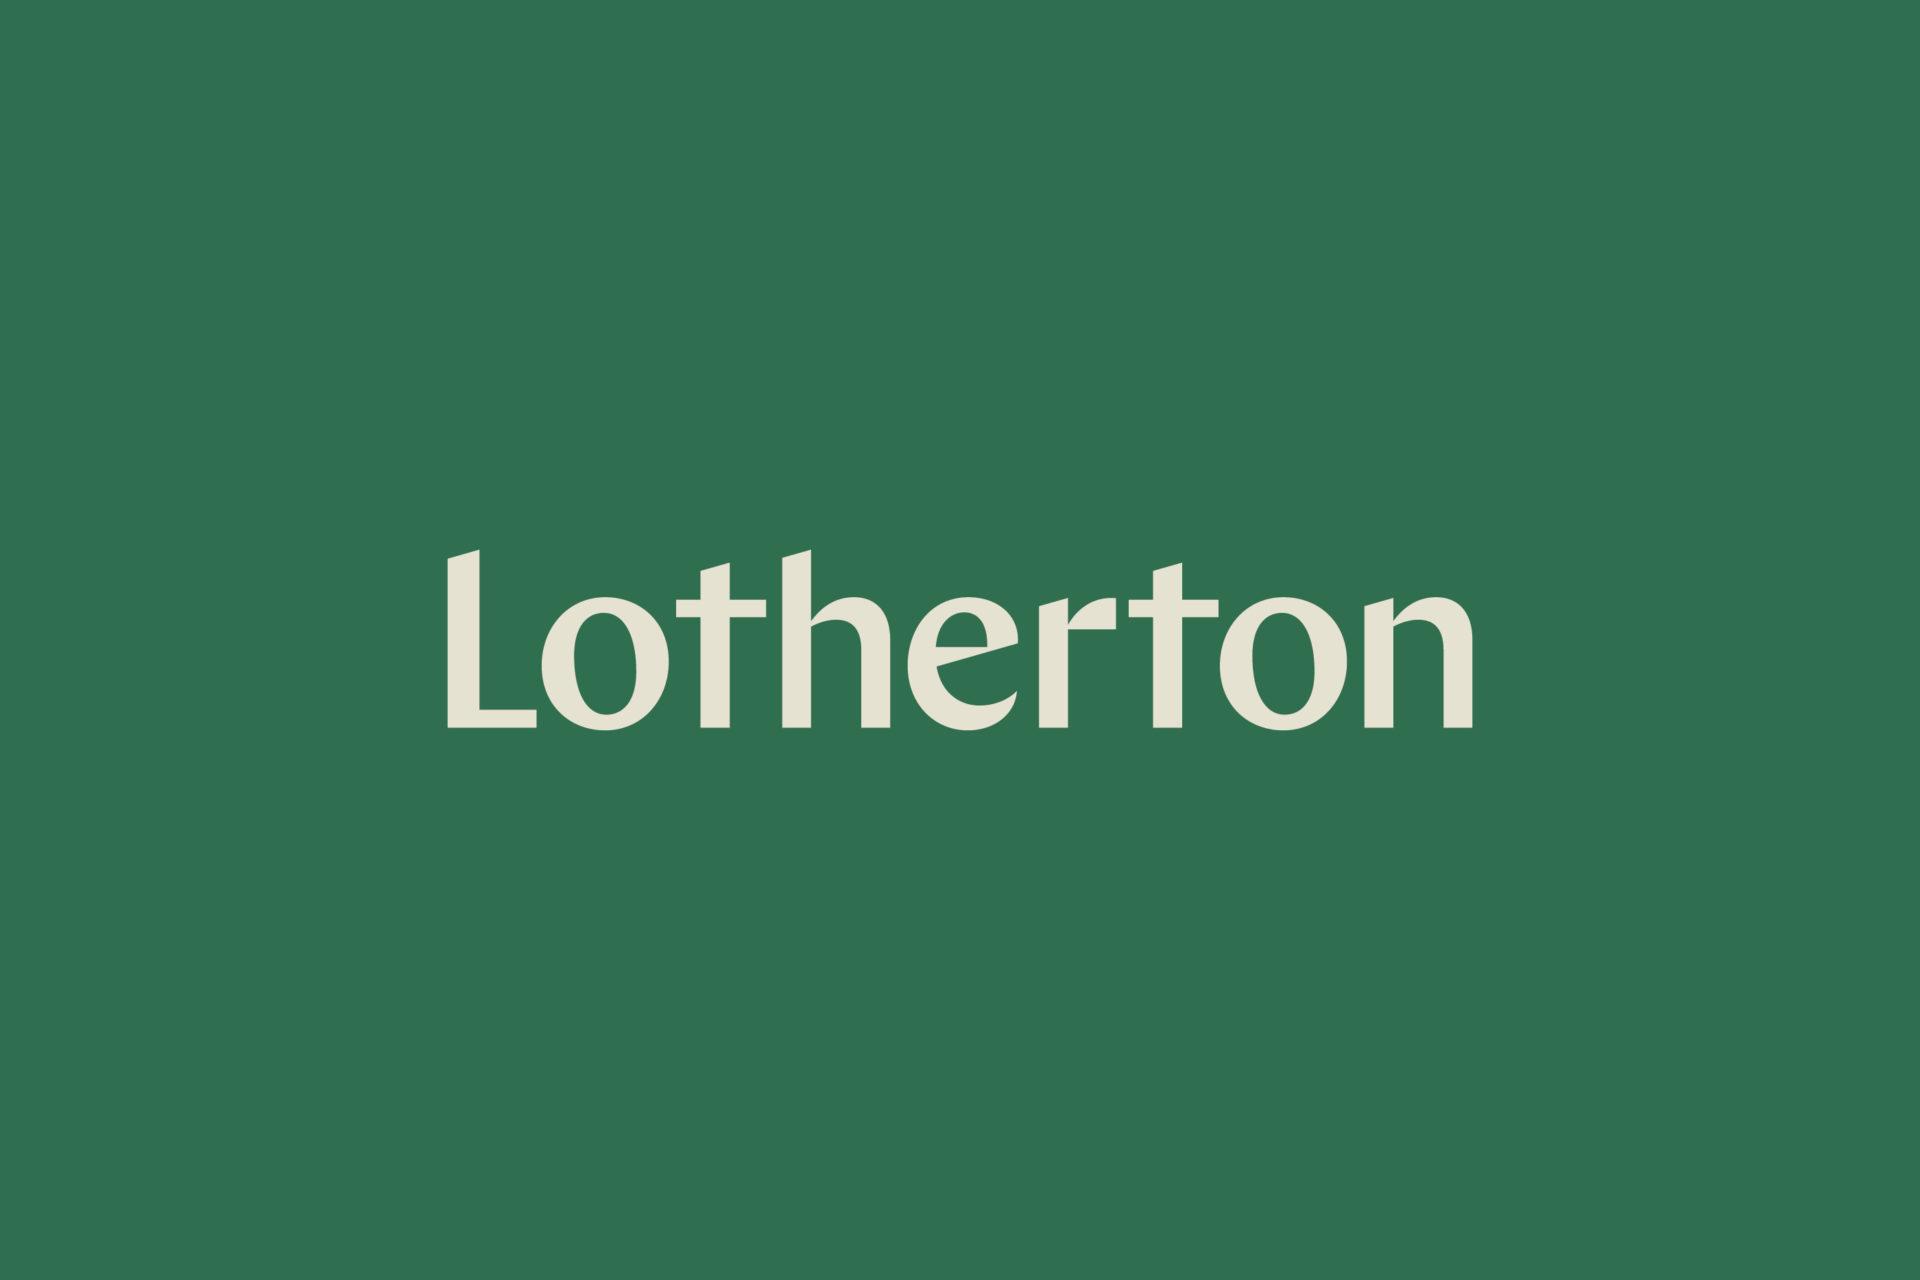 Lotherton_Branding_22-scaled.jpg